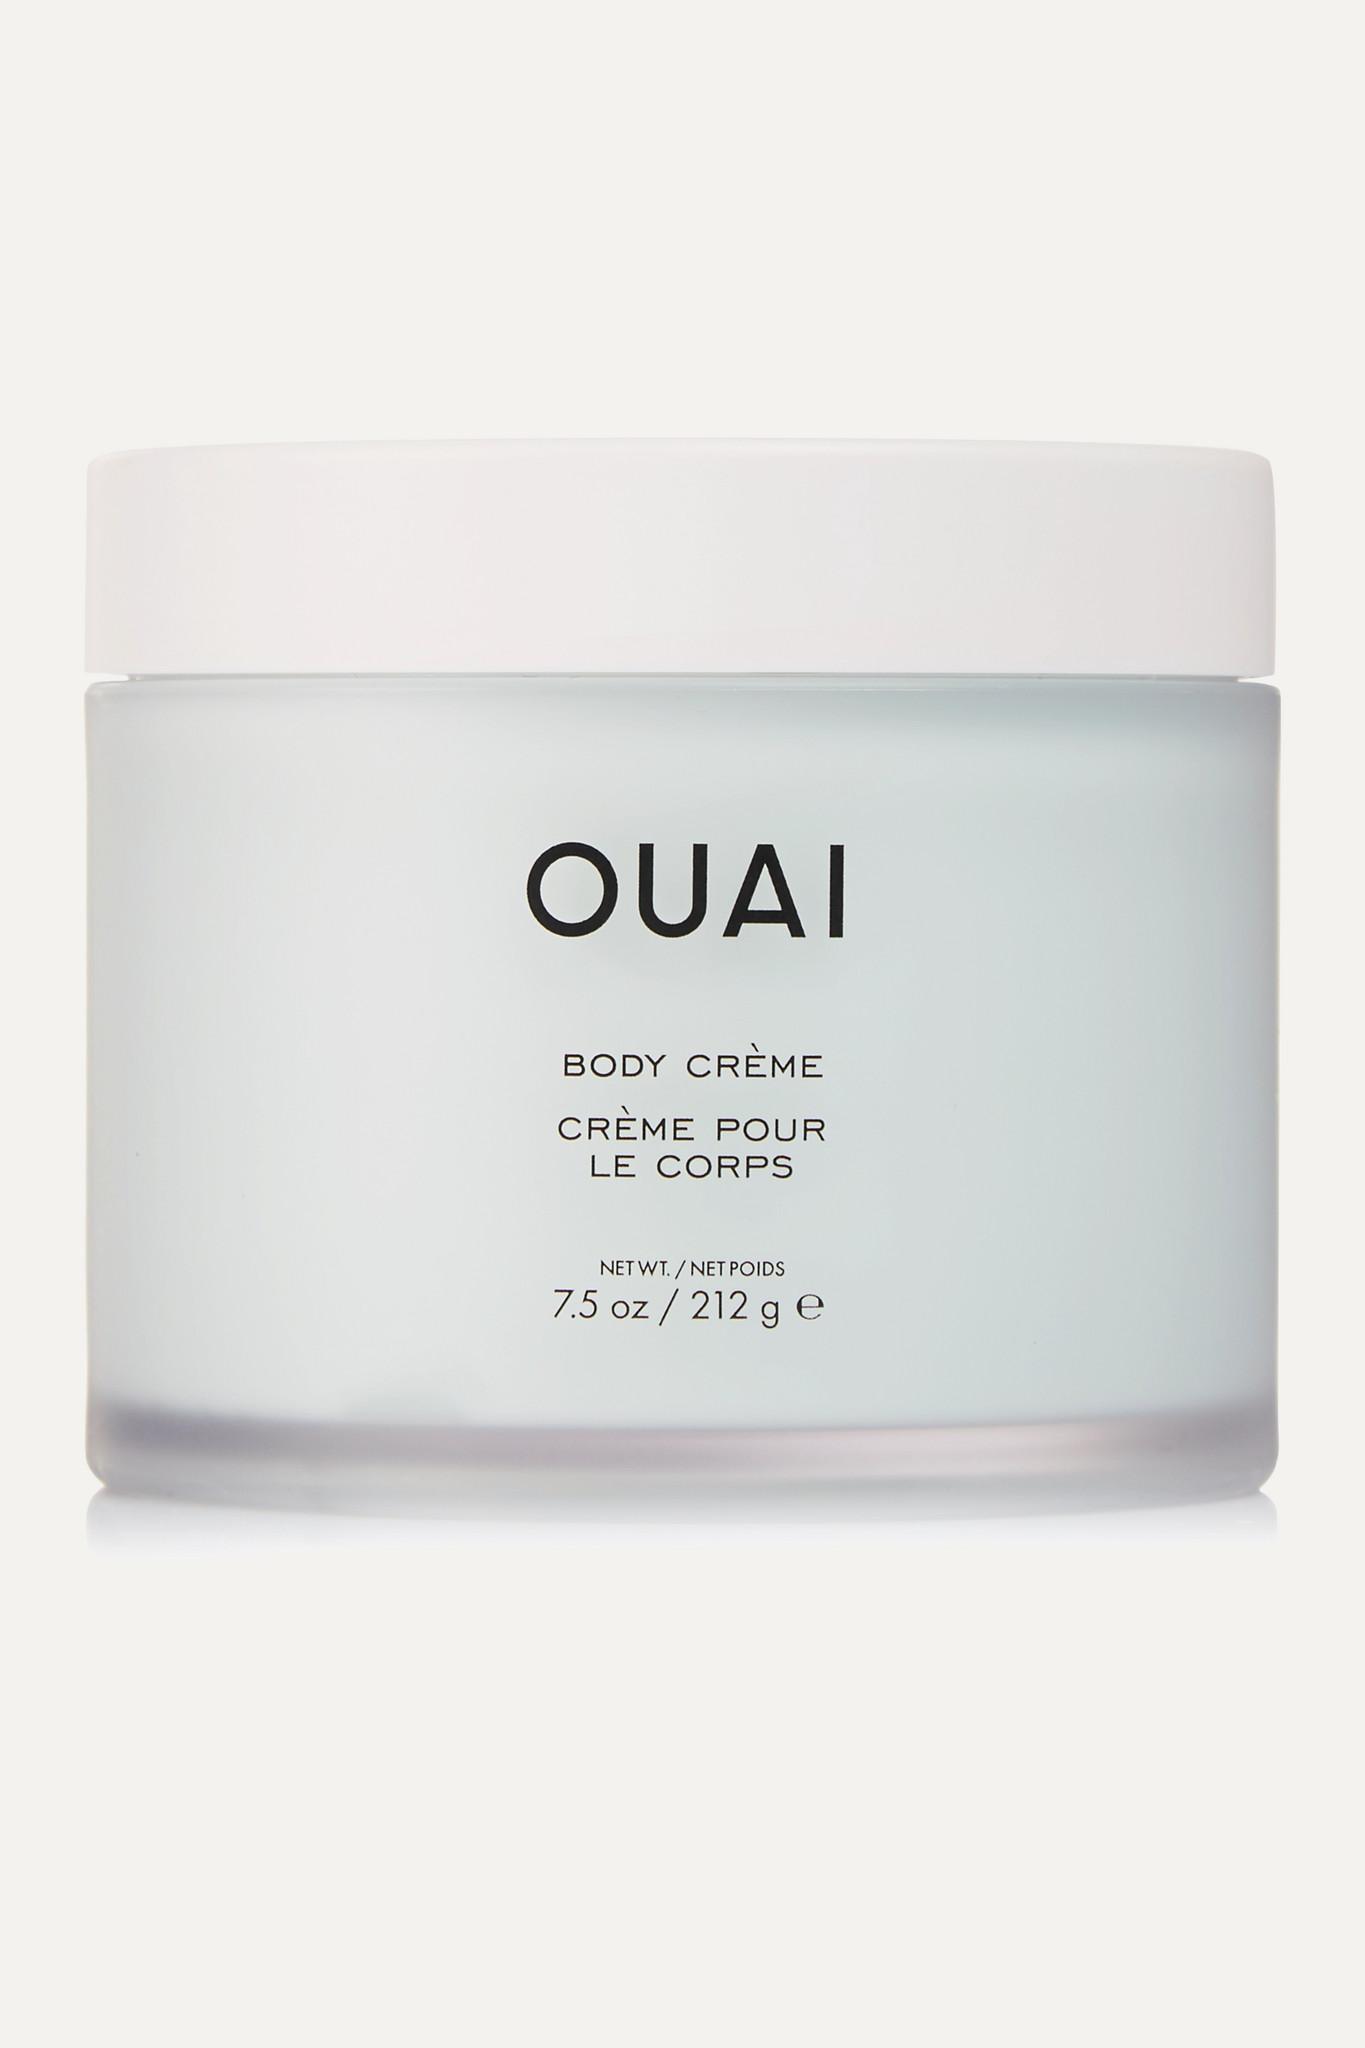 OUAI HAIRCARE - Body Crème, 212g - one size